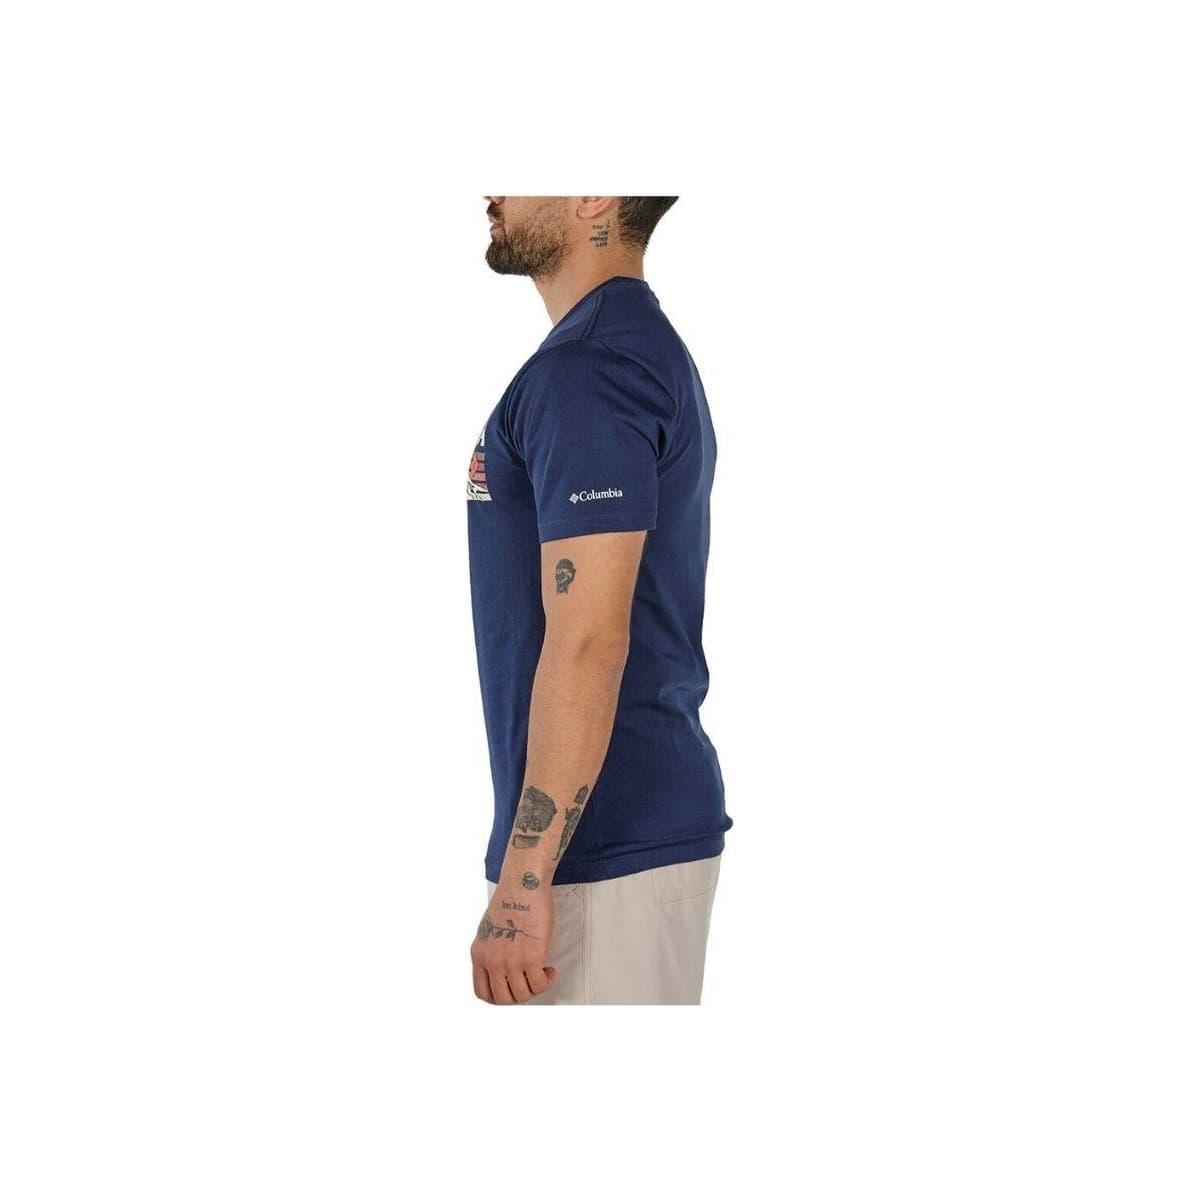 Elevated Outlook Graphic Erkek Mavi Tişört (CS0132_464)